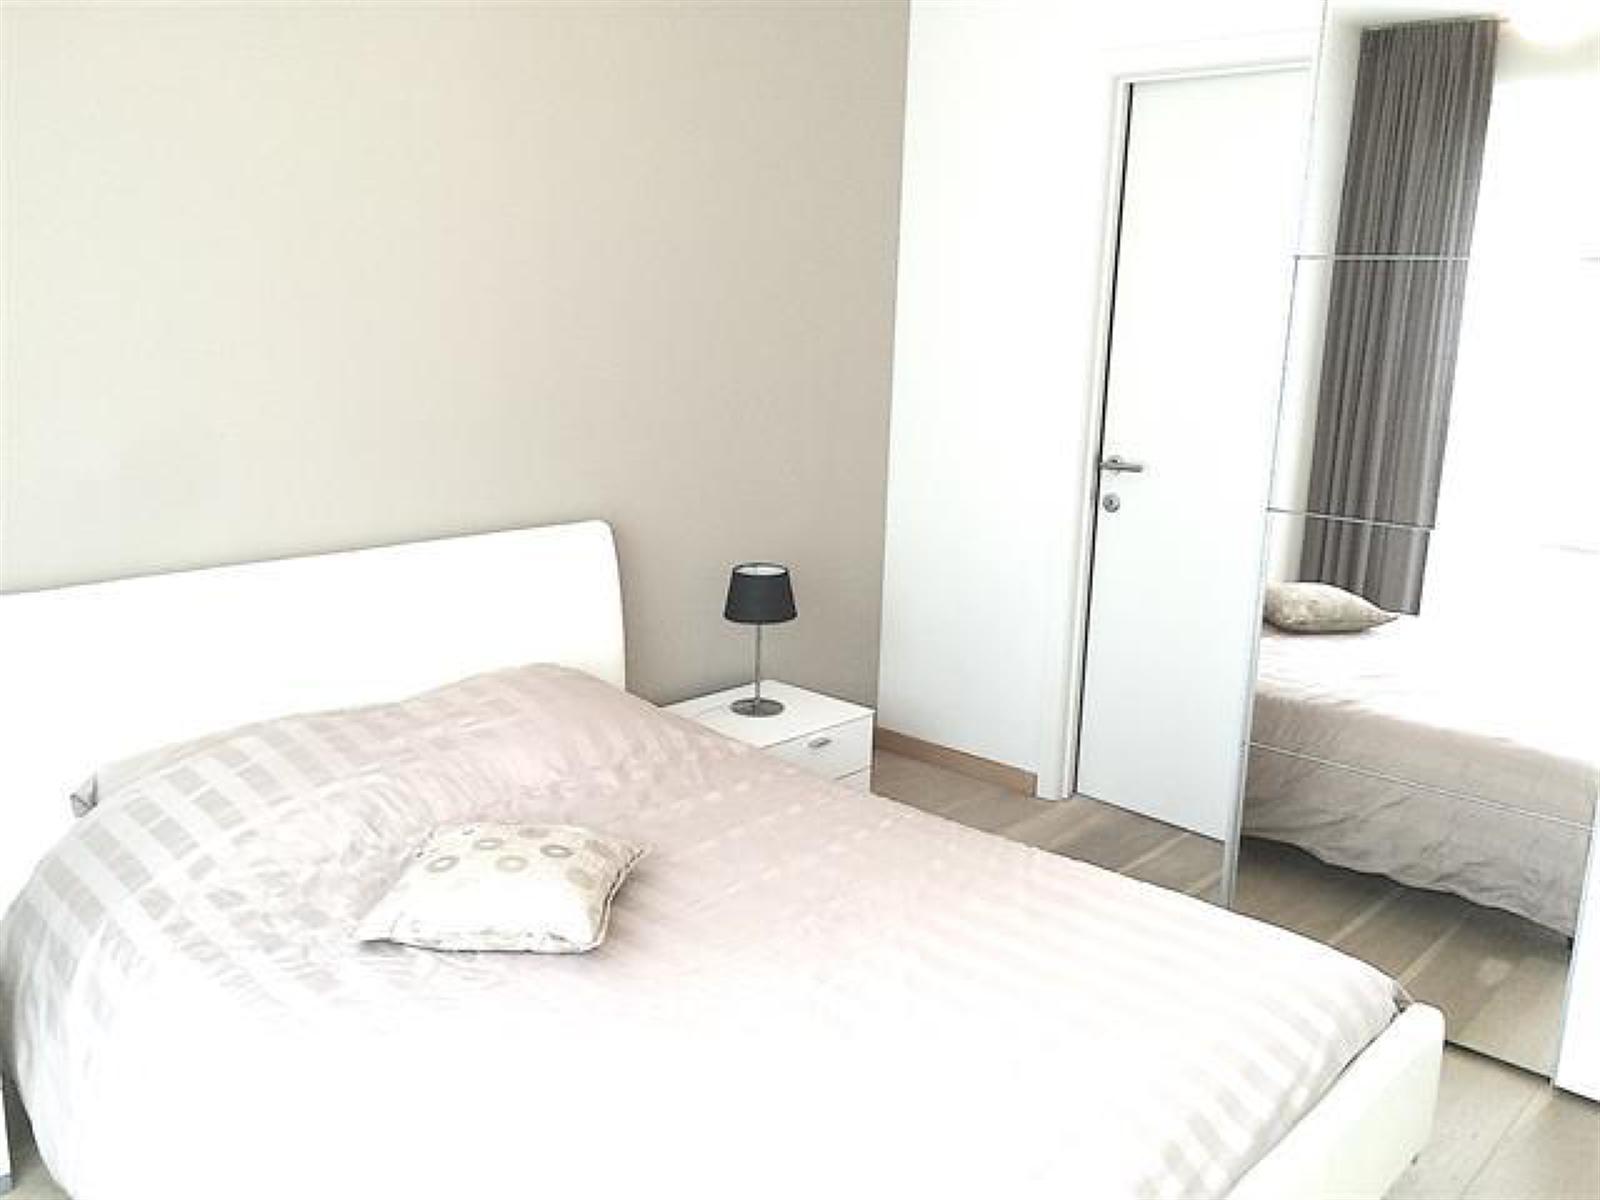 Flat - Etterbeek - #4521005-5